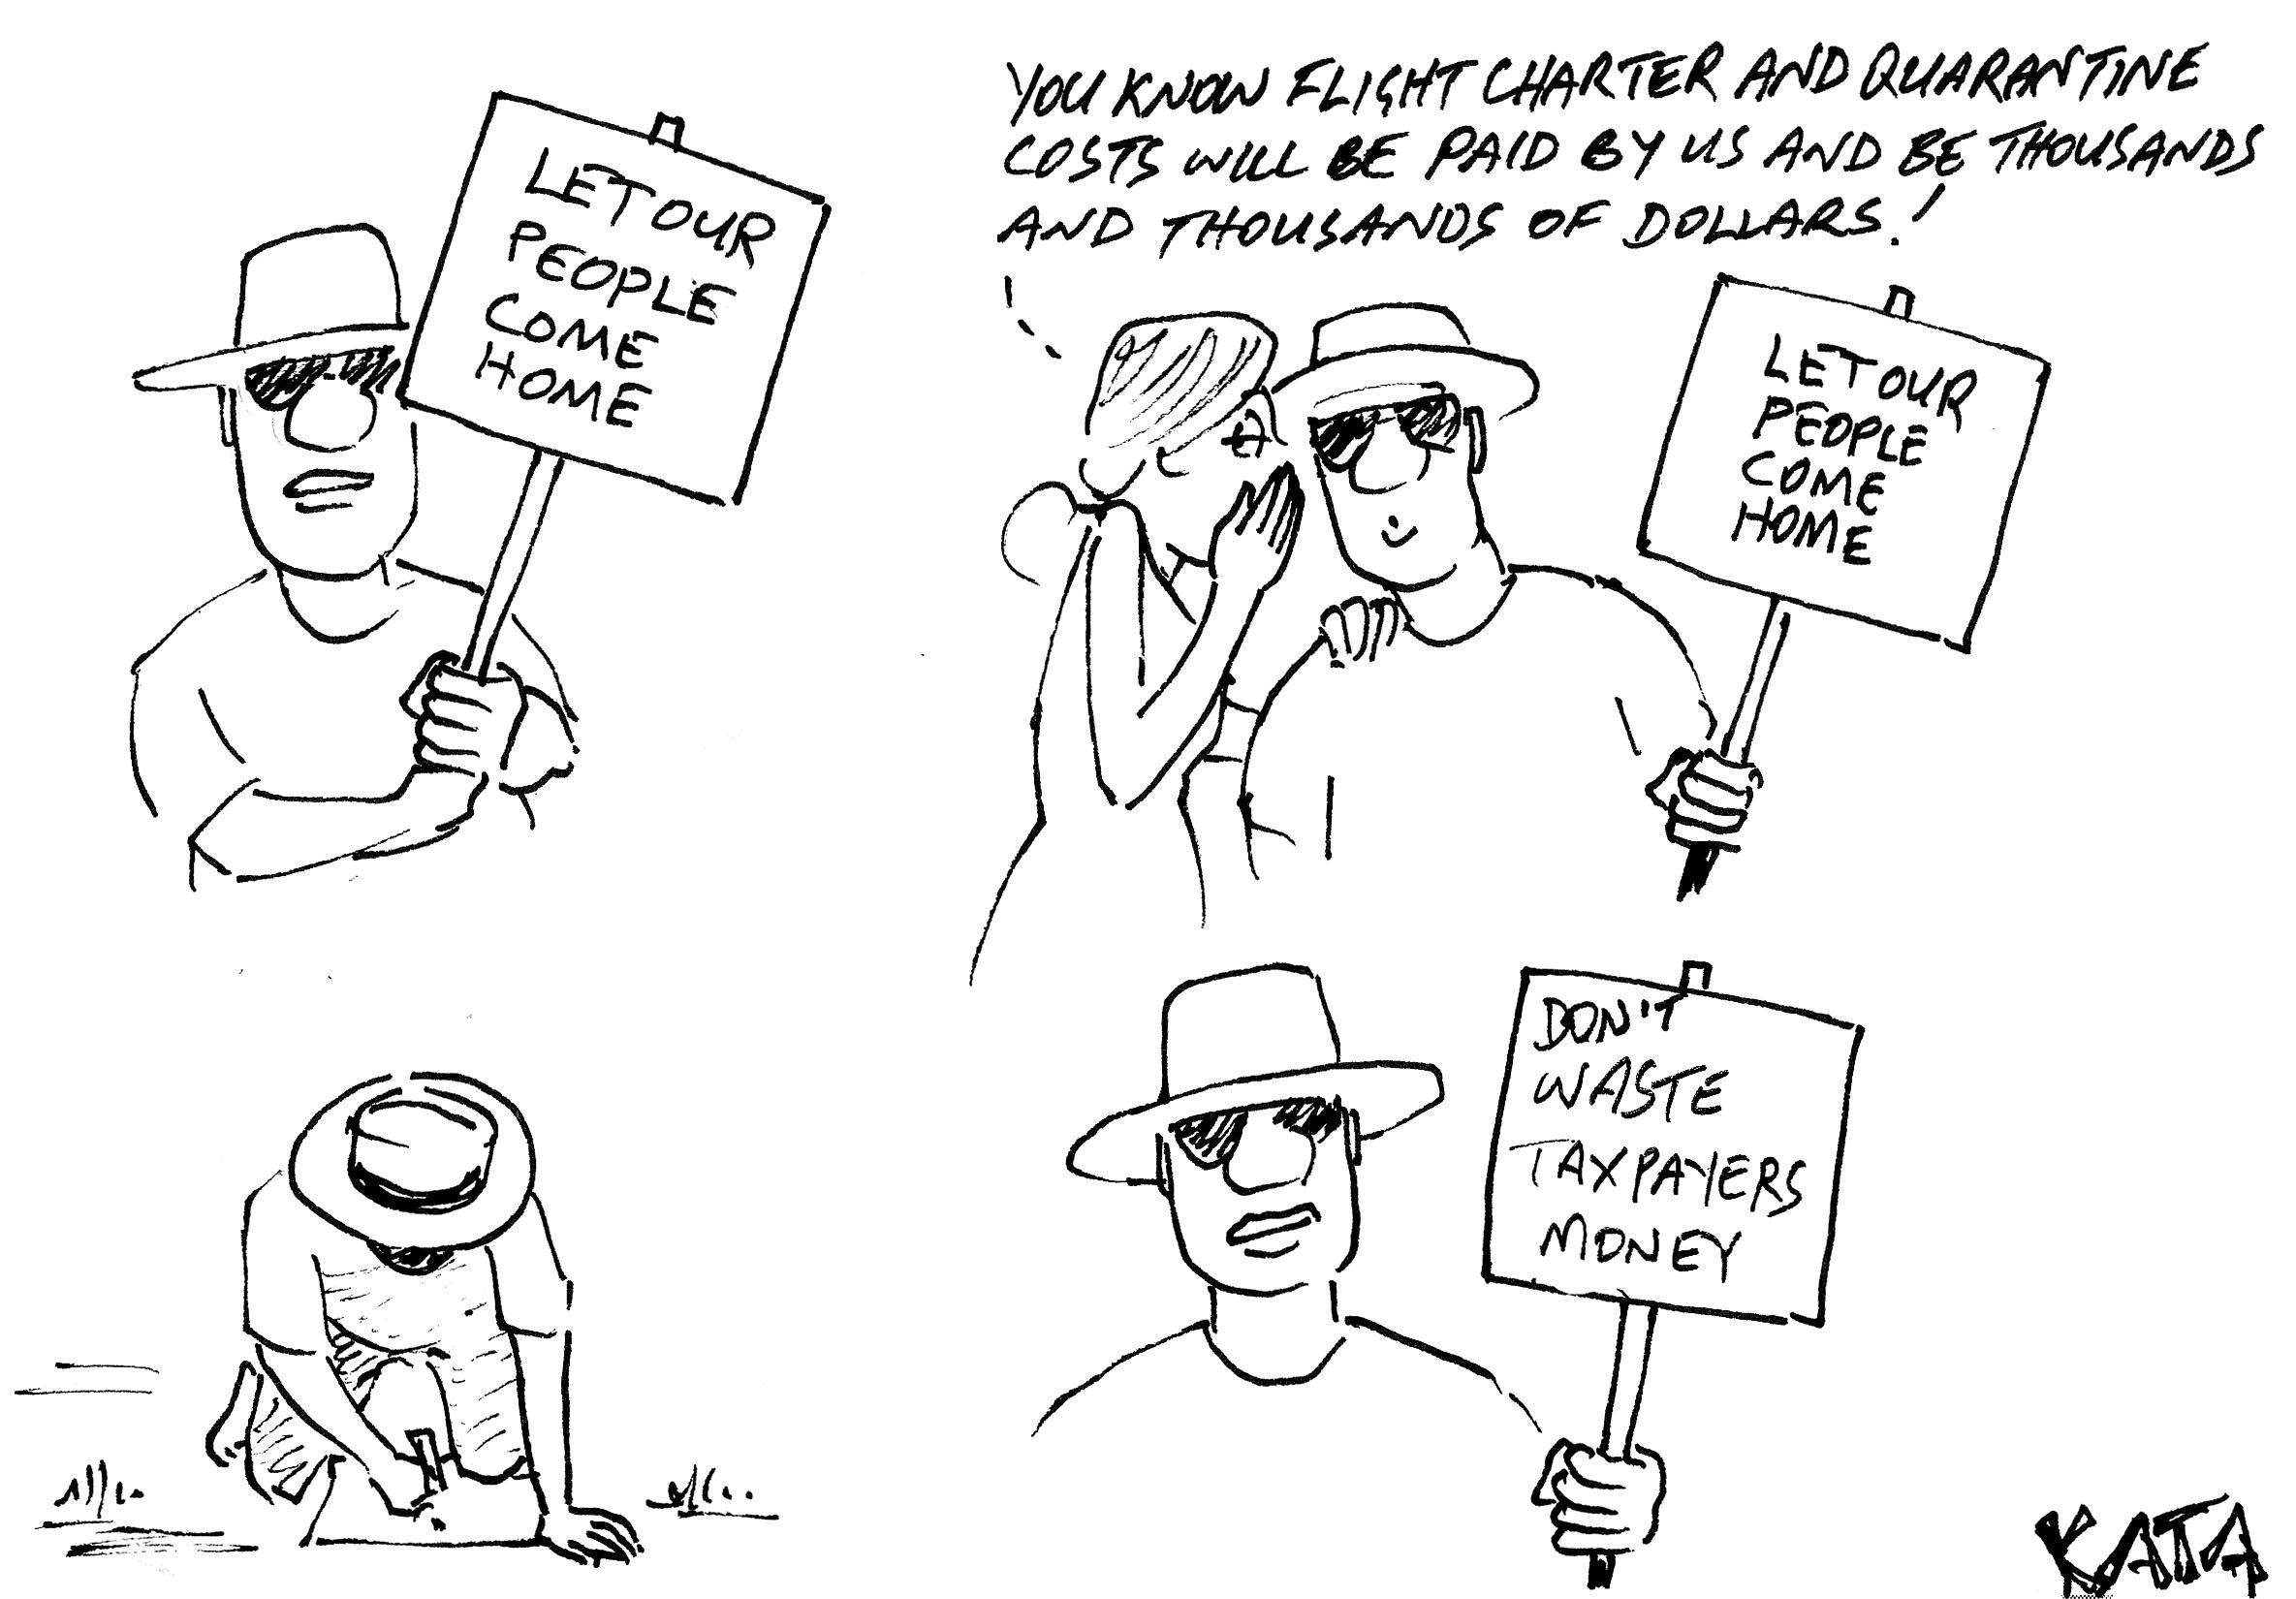 KATA: Chartered Flights